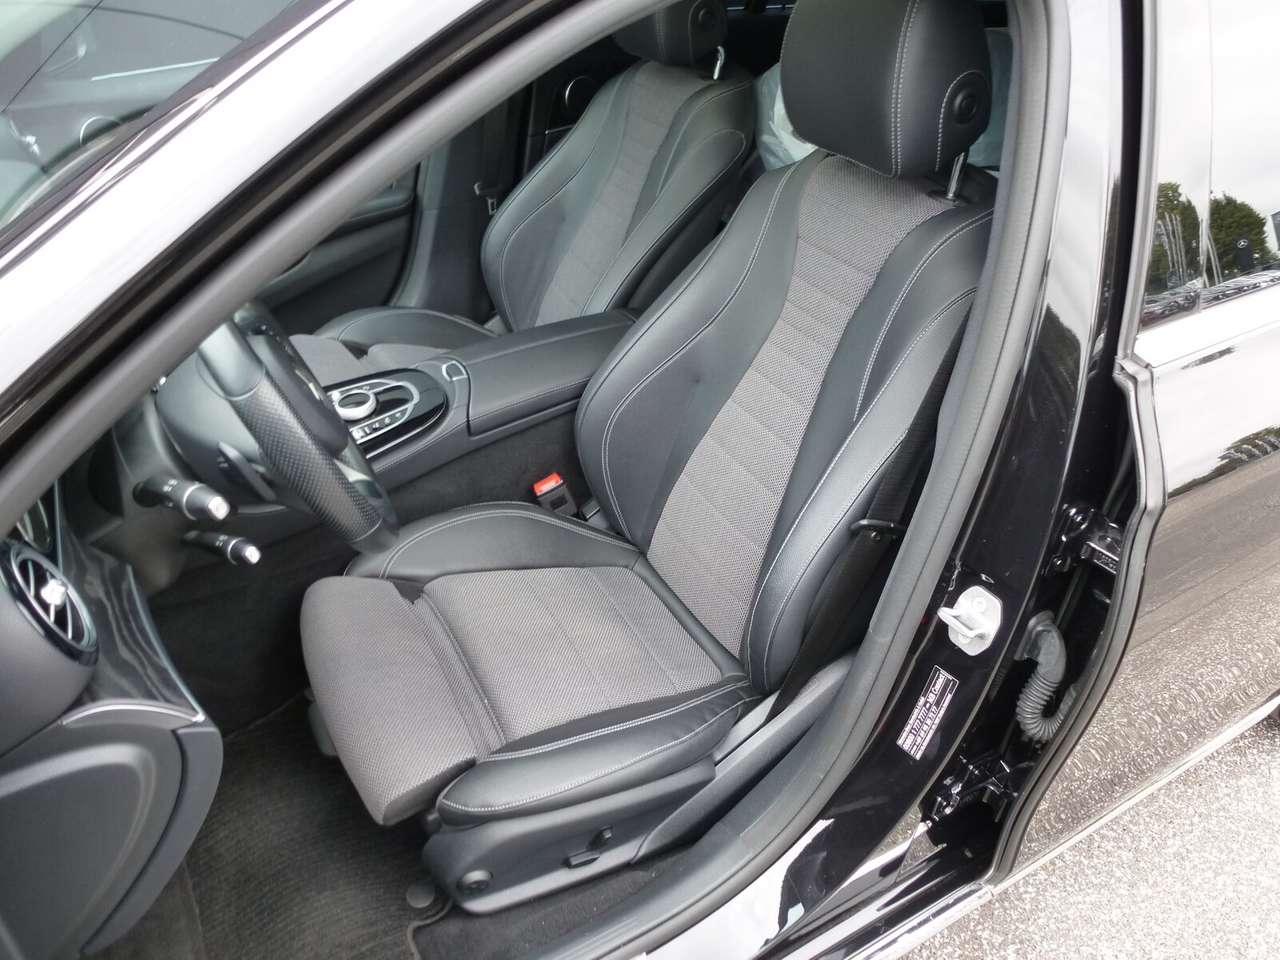 Mercedes-Benz Classe E IV (S212) 220d 9G-Tronic